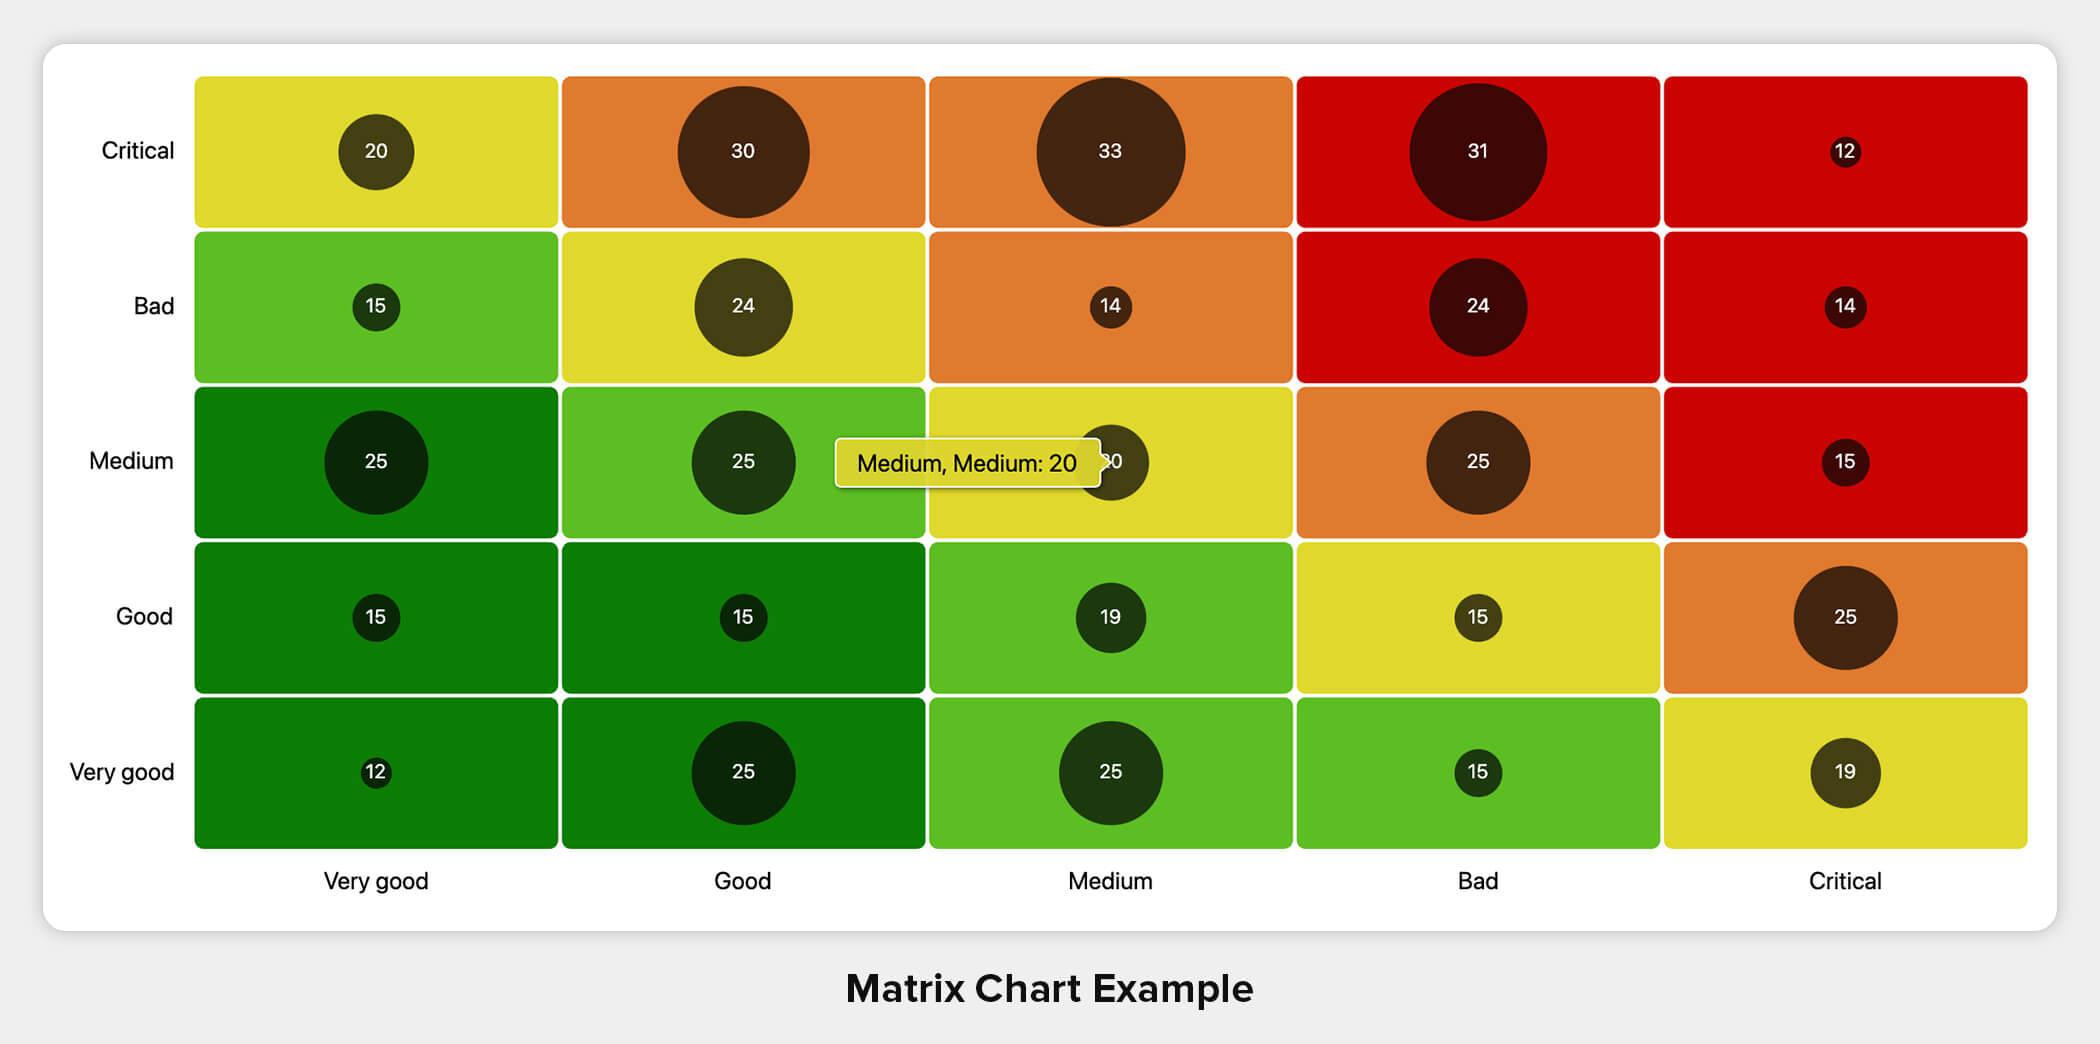 Matrix Chart Example